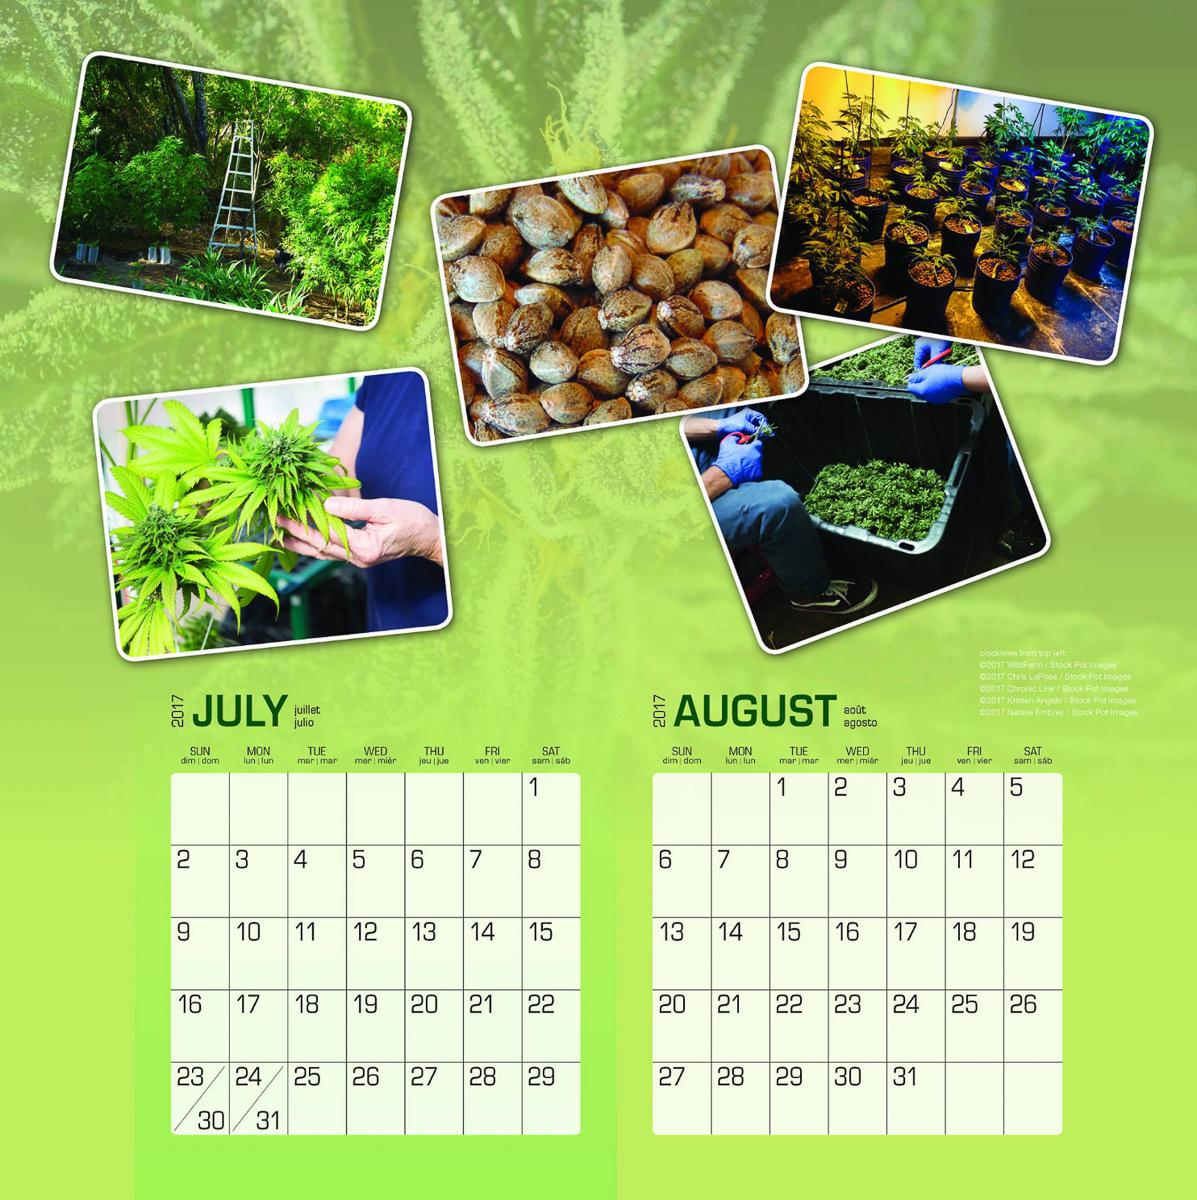 jorge-cervantes-cannabis-calendar.jpg